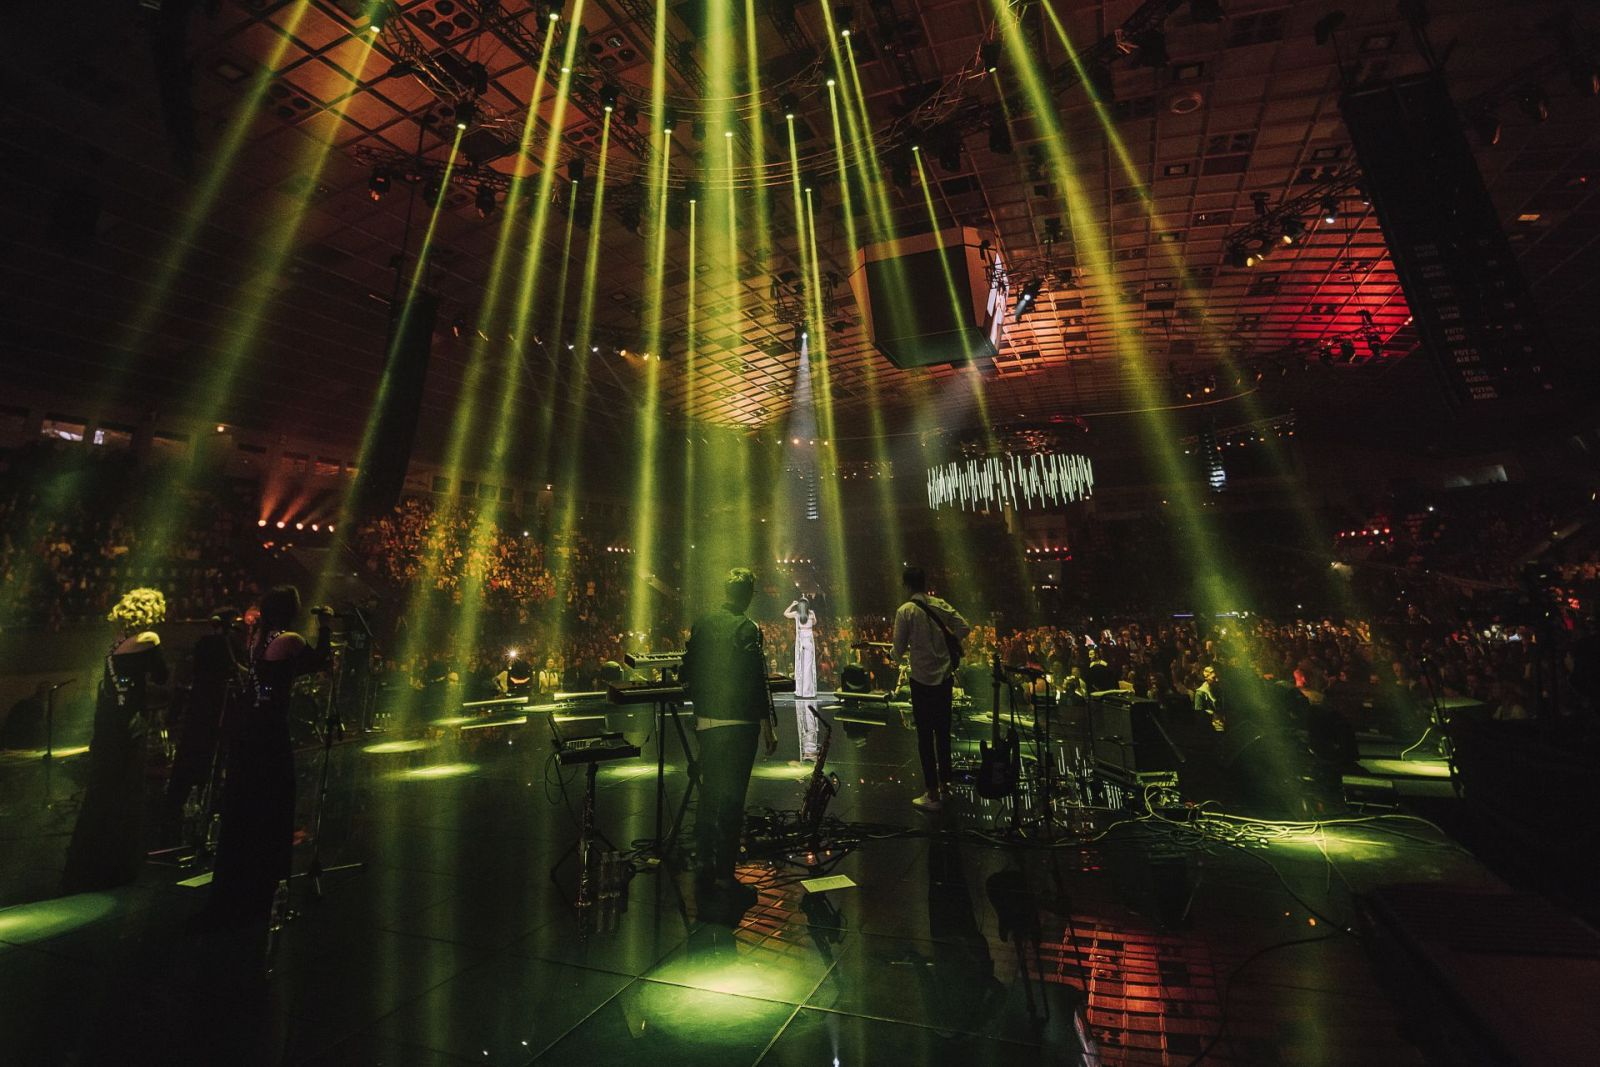 Концерт Джамалы во Дворце спорта